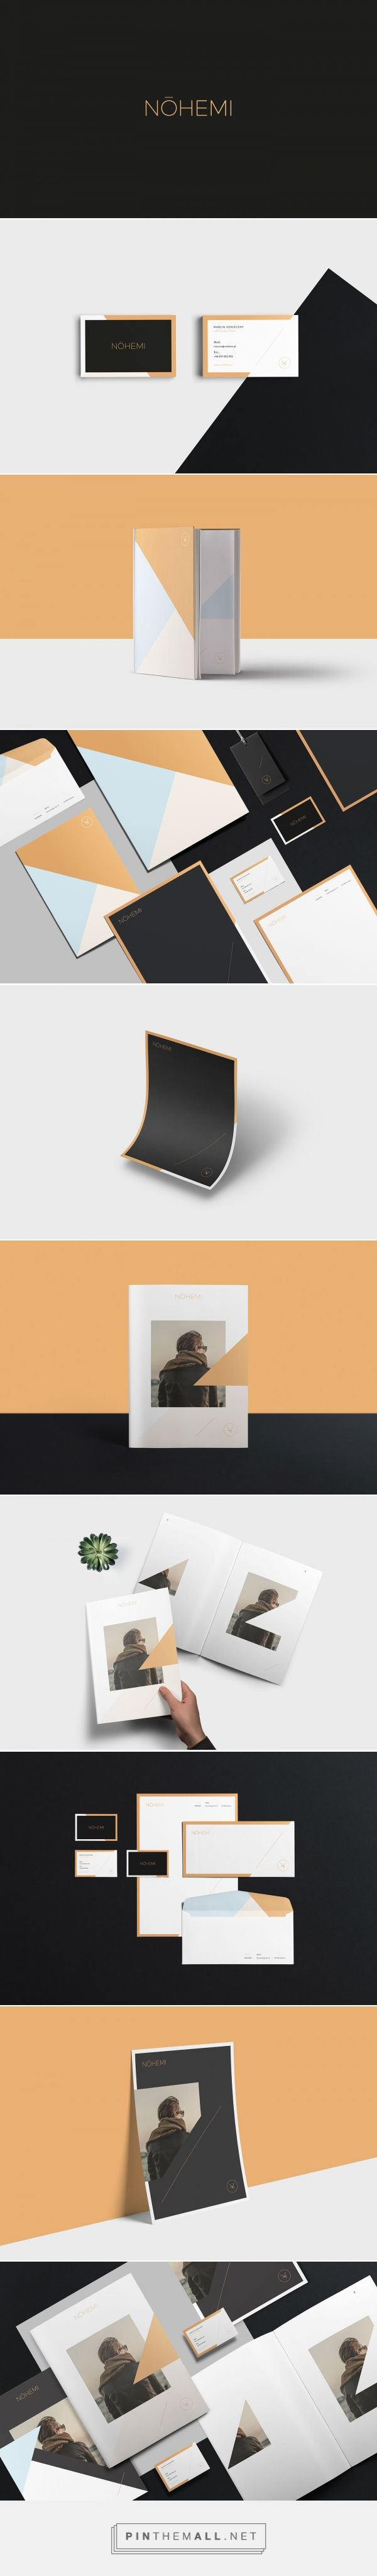 Nohemi Fashion Retail Branding by Przemek Bizon | Fivestar Branding Agency – Design and Branding Agency & Curated Inspiration Gallery